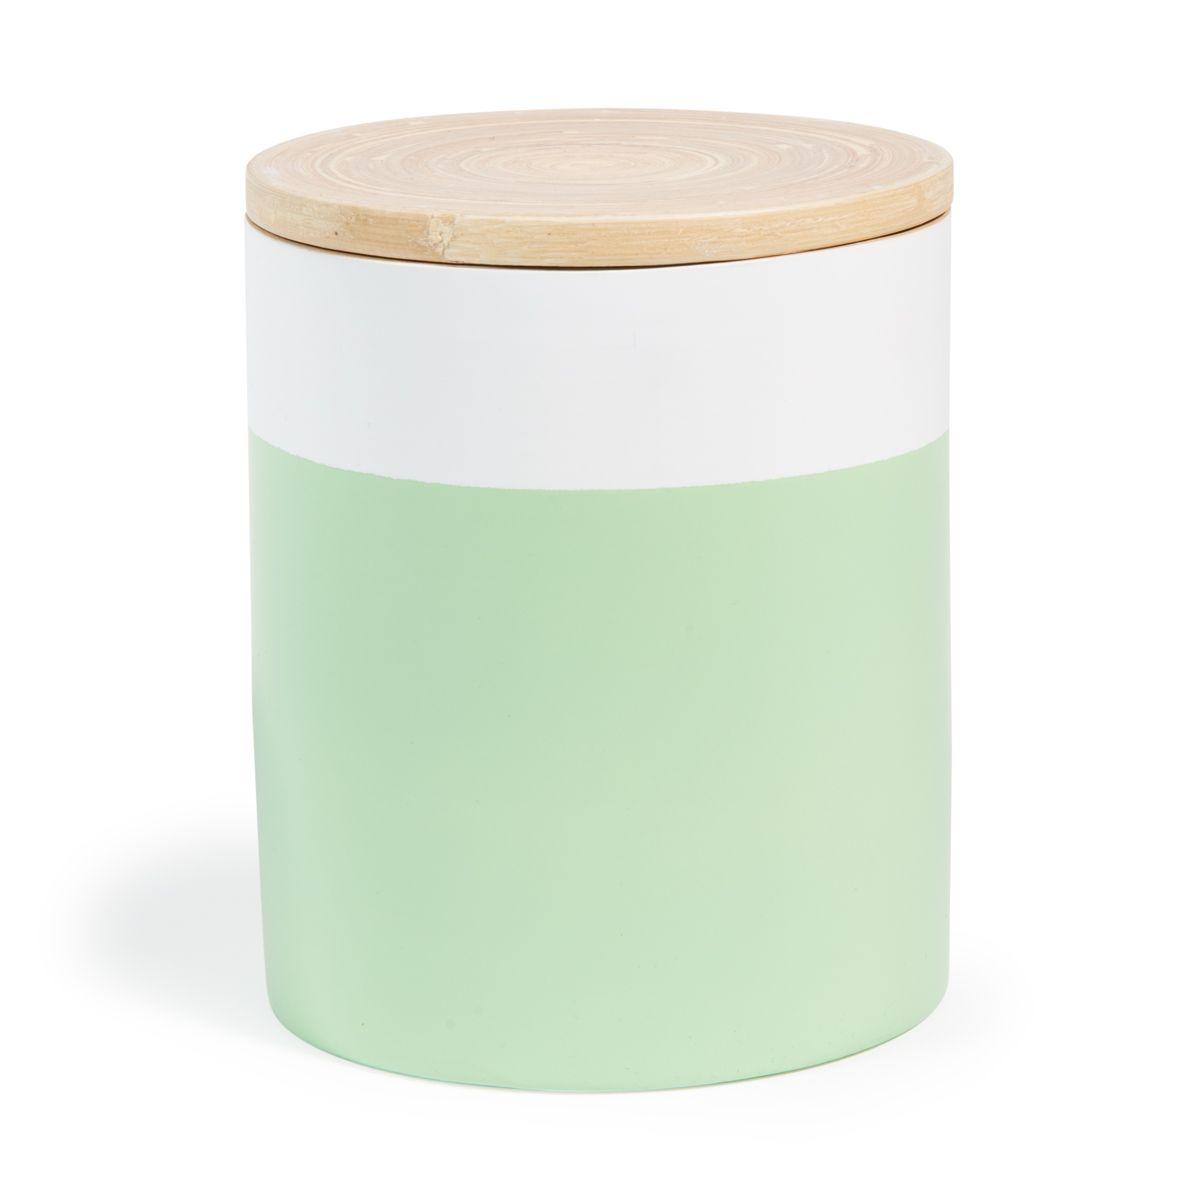 Konservenglas Scandinave, Bambus grün, H 16 cm